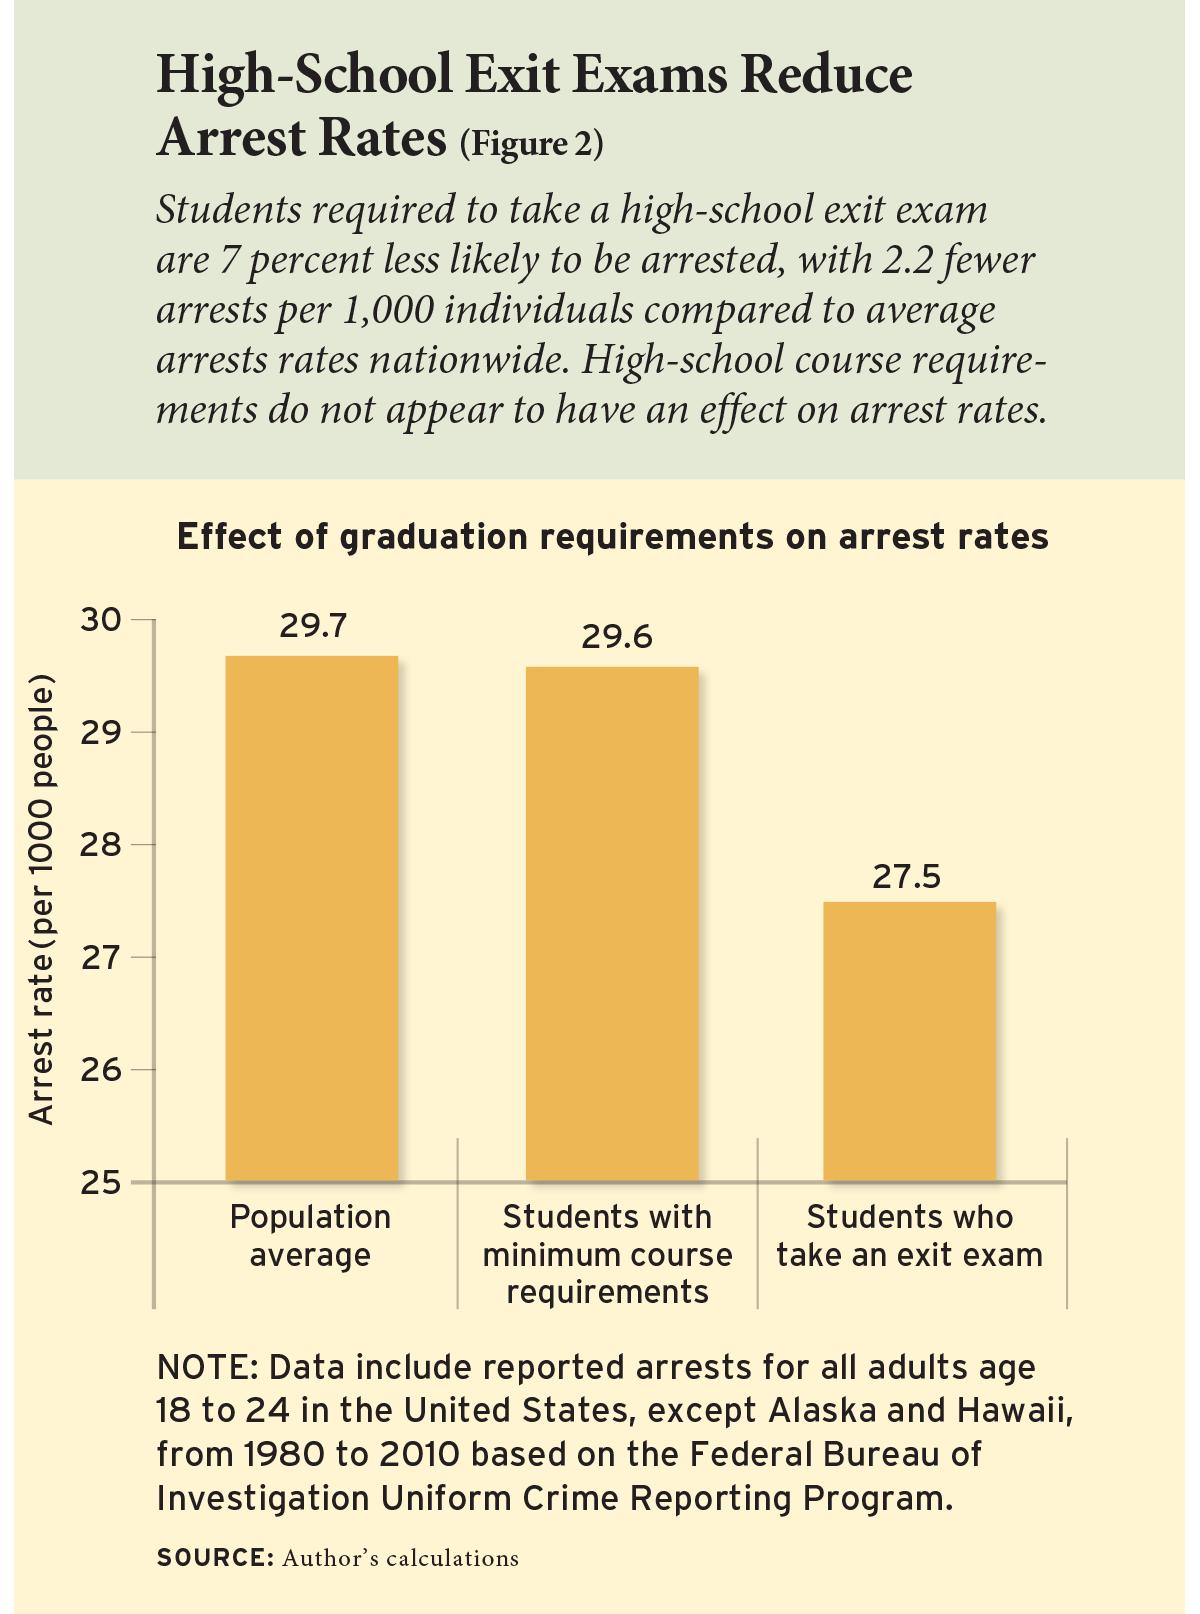 High-School Exit Exams Reduce Arrest Rates (Figure 2)